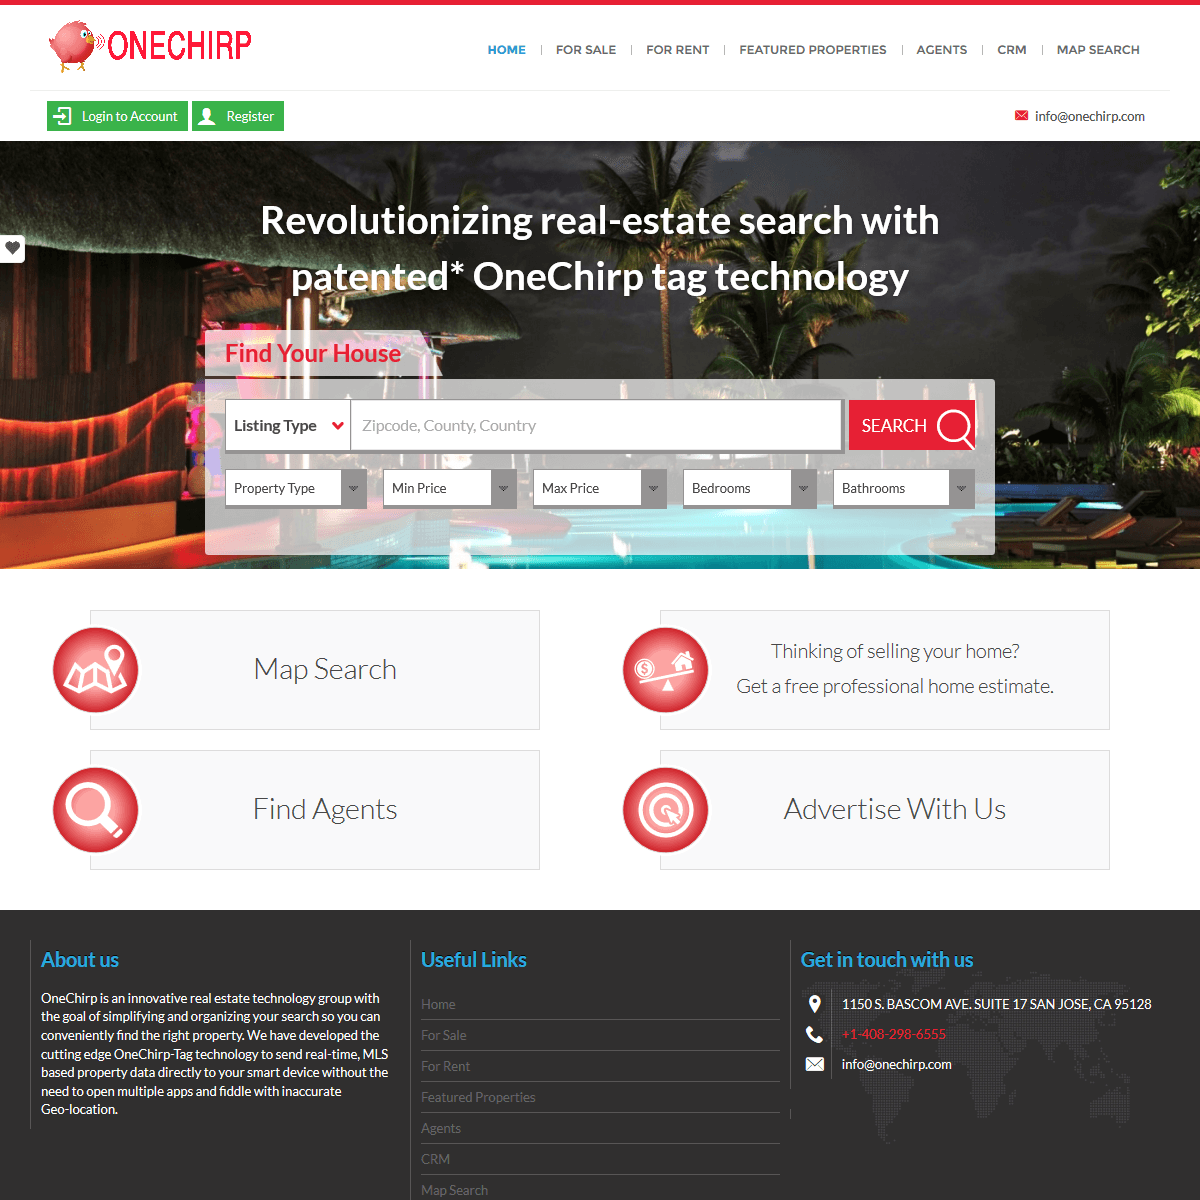 onechirp.com